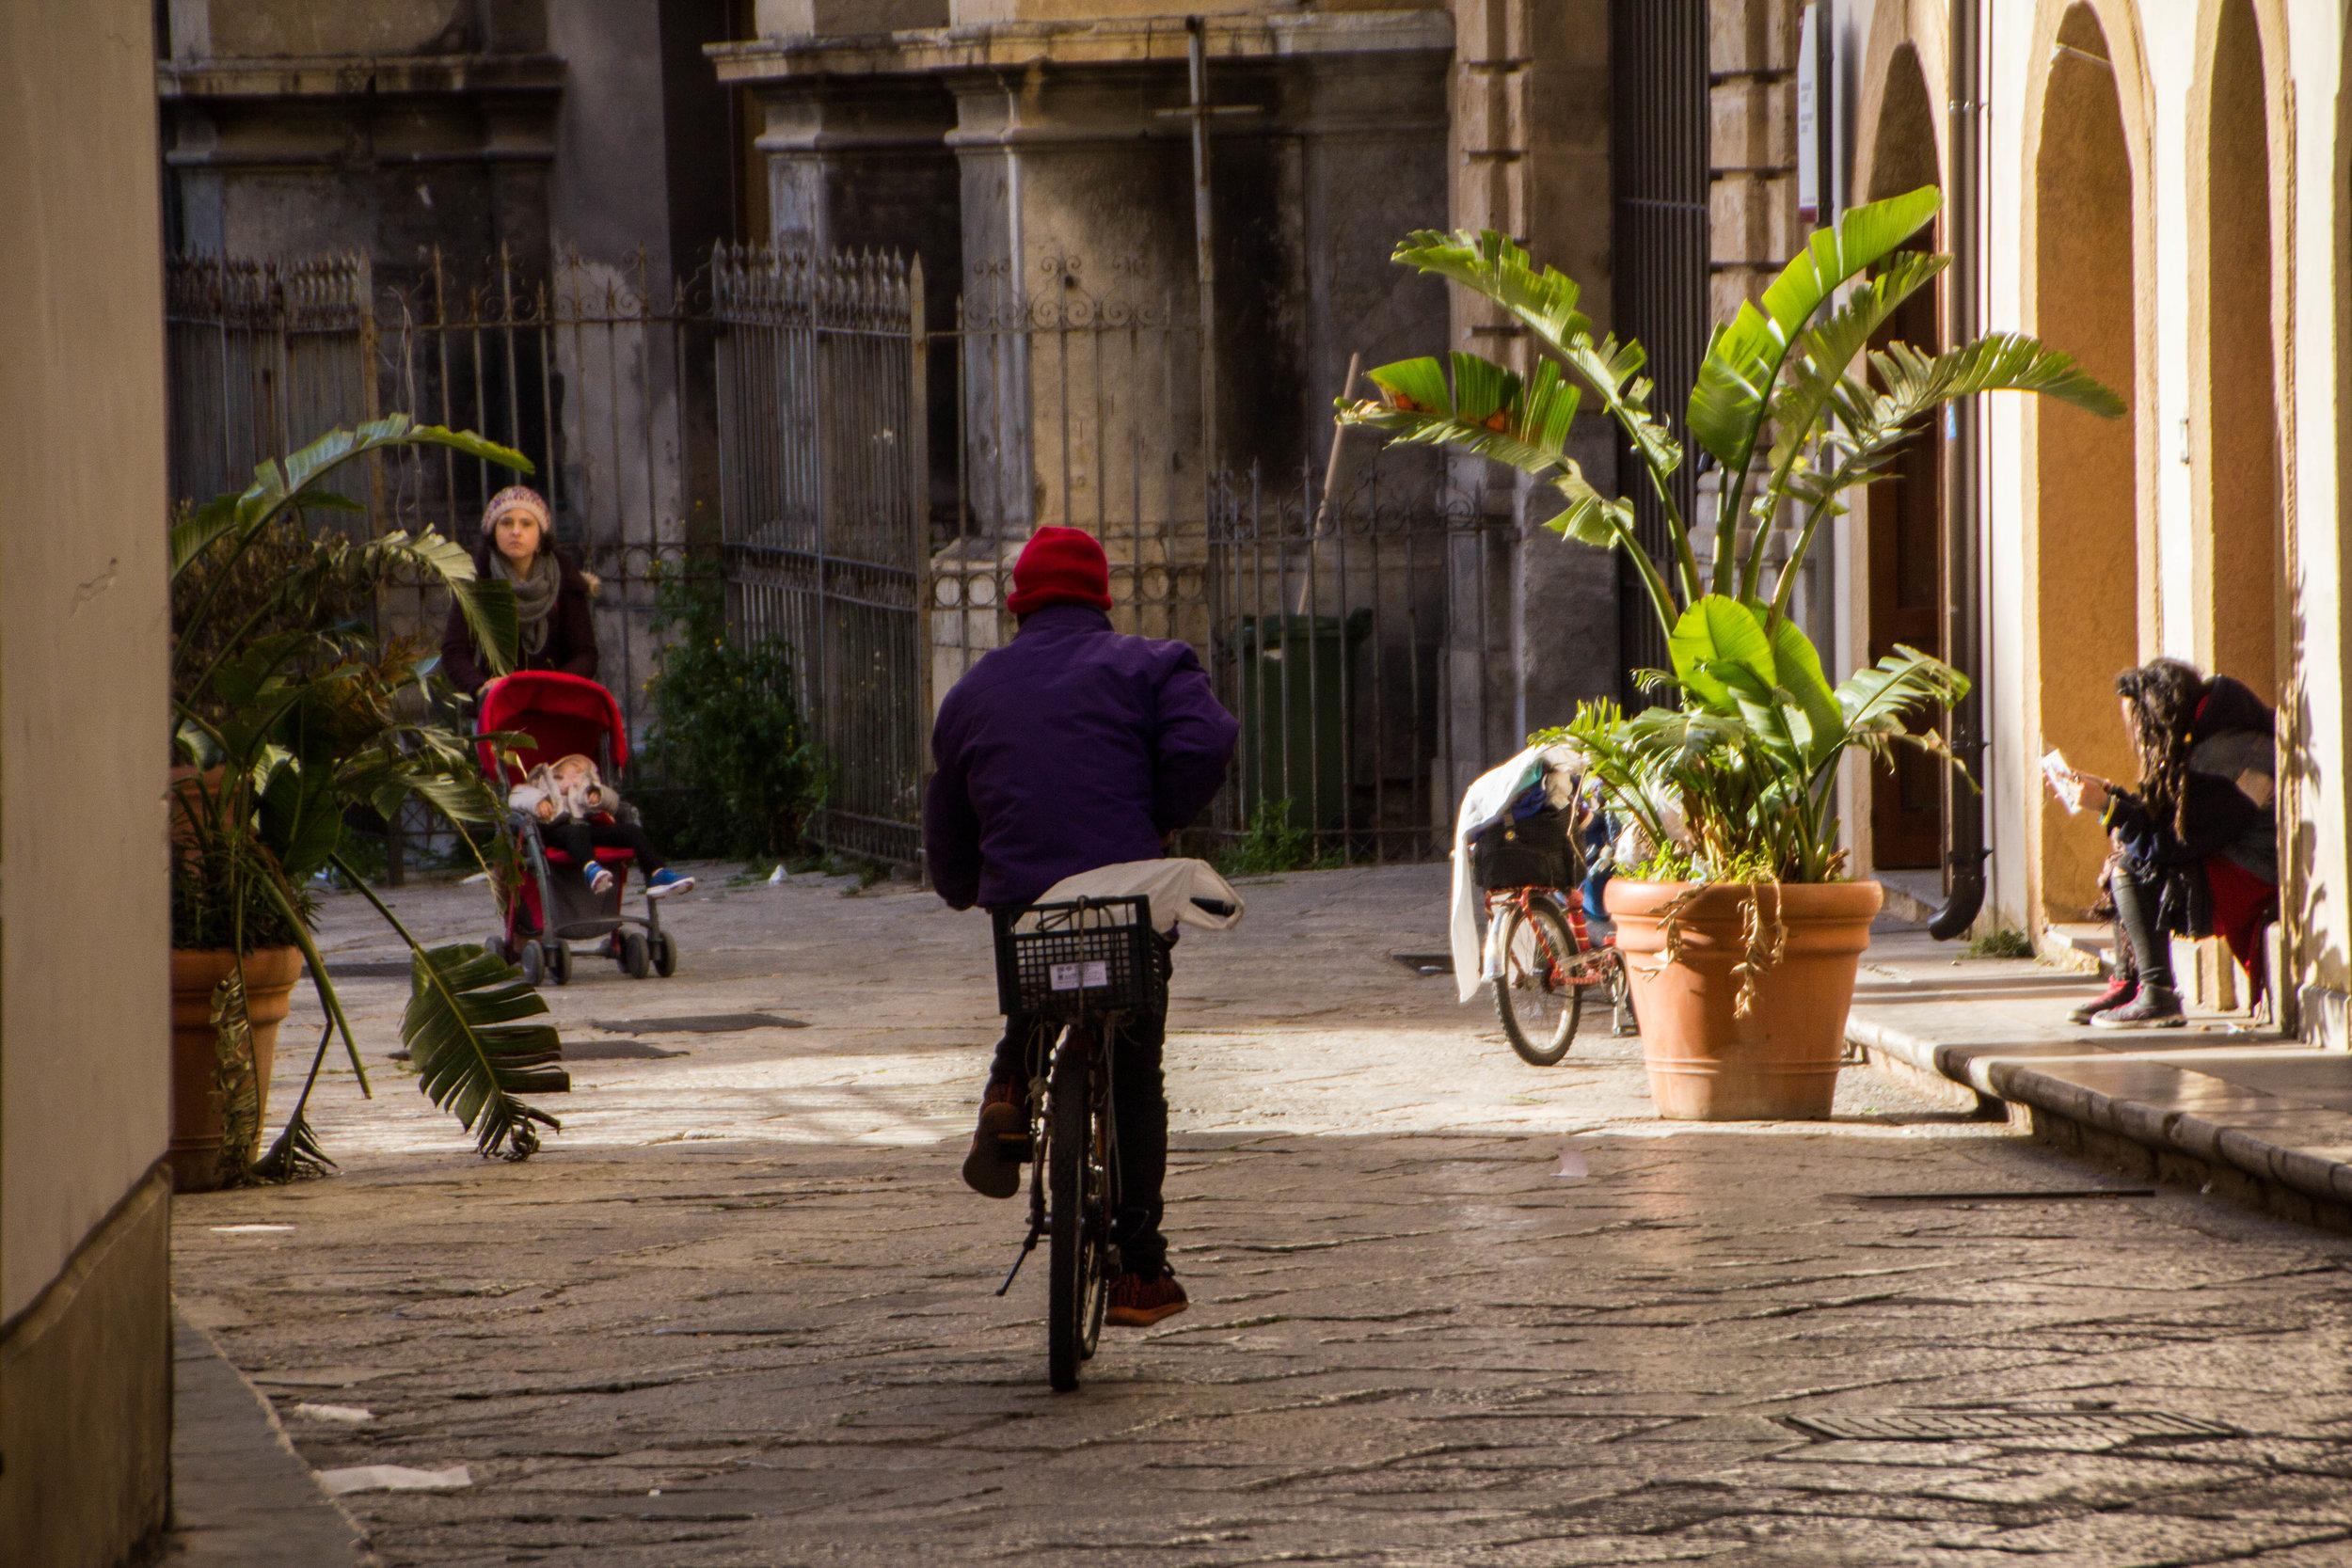 streets-palermo-sicily-10.jpg